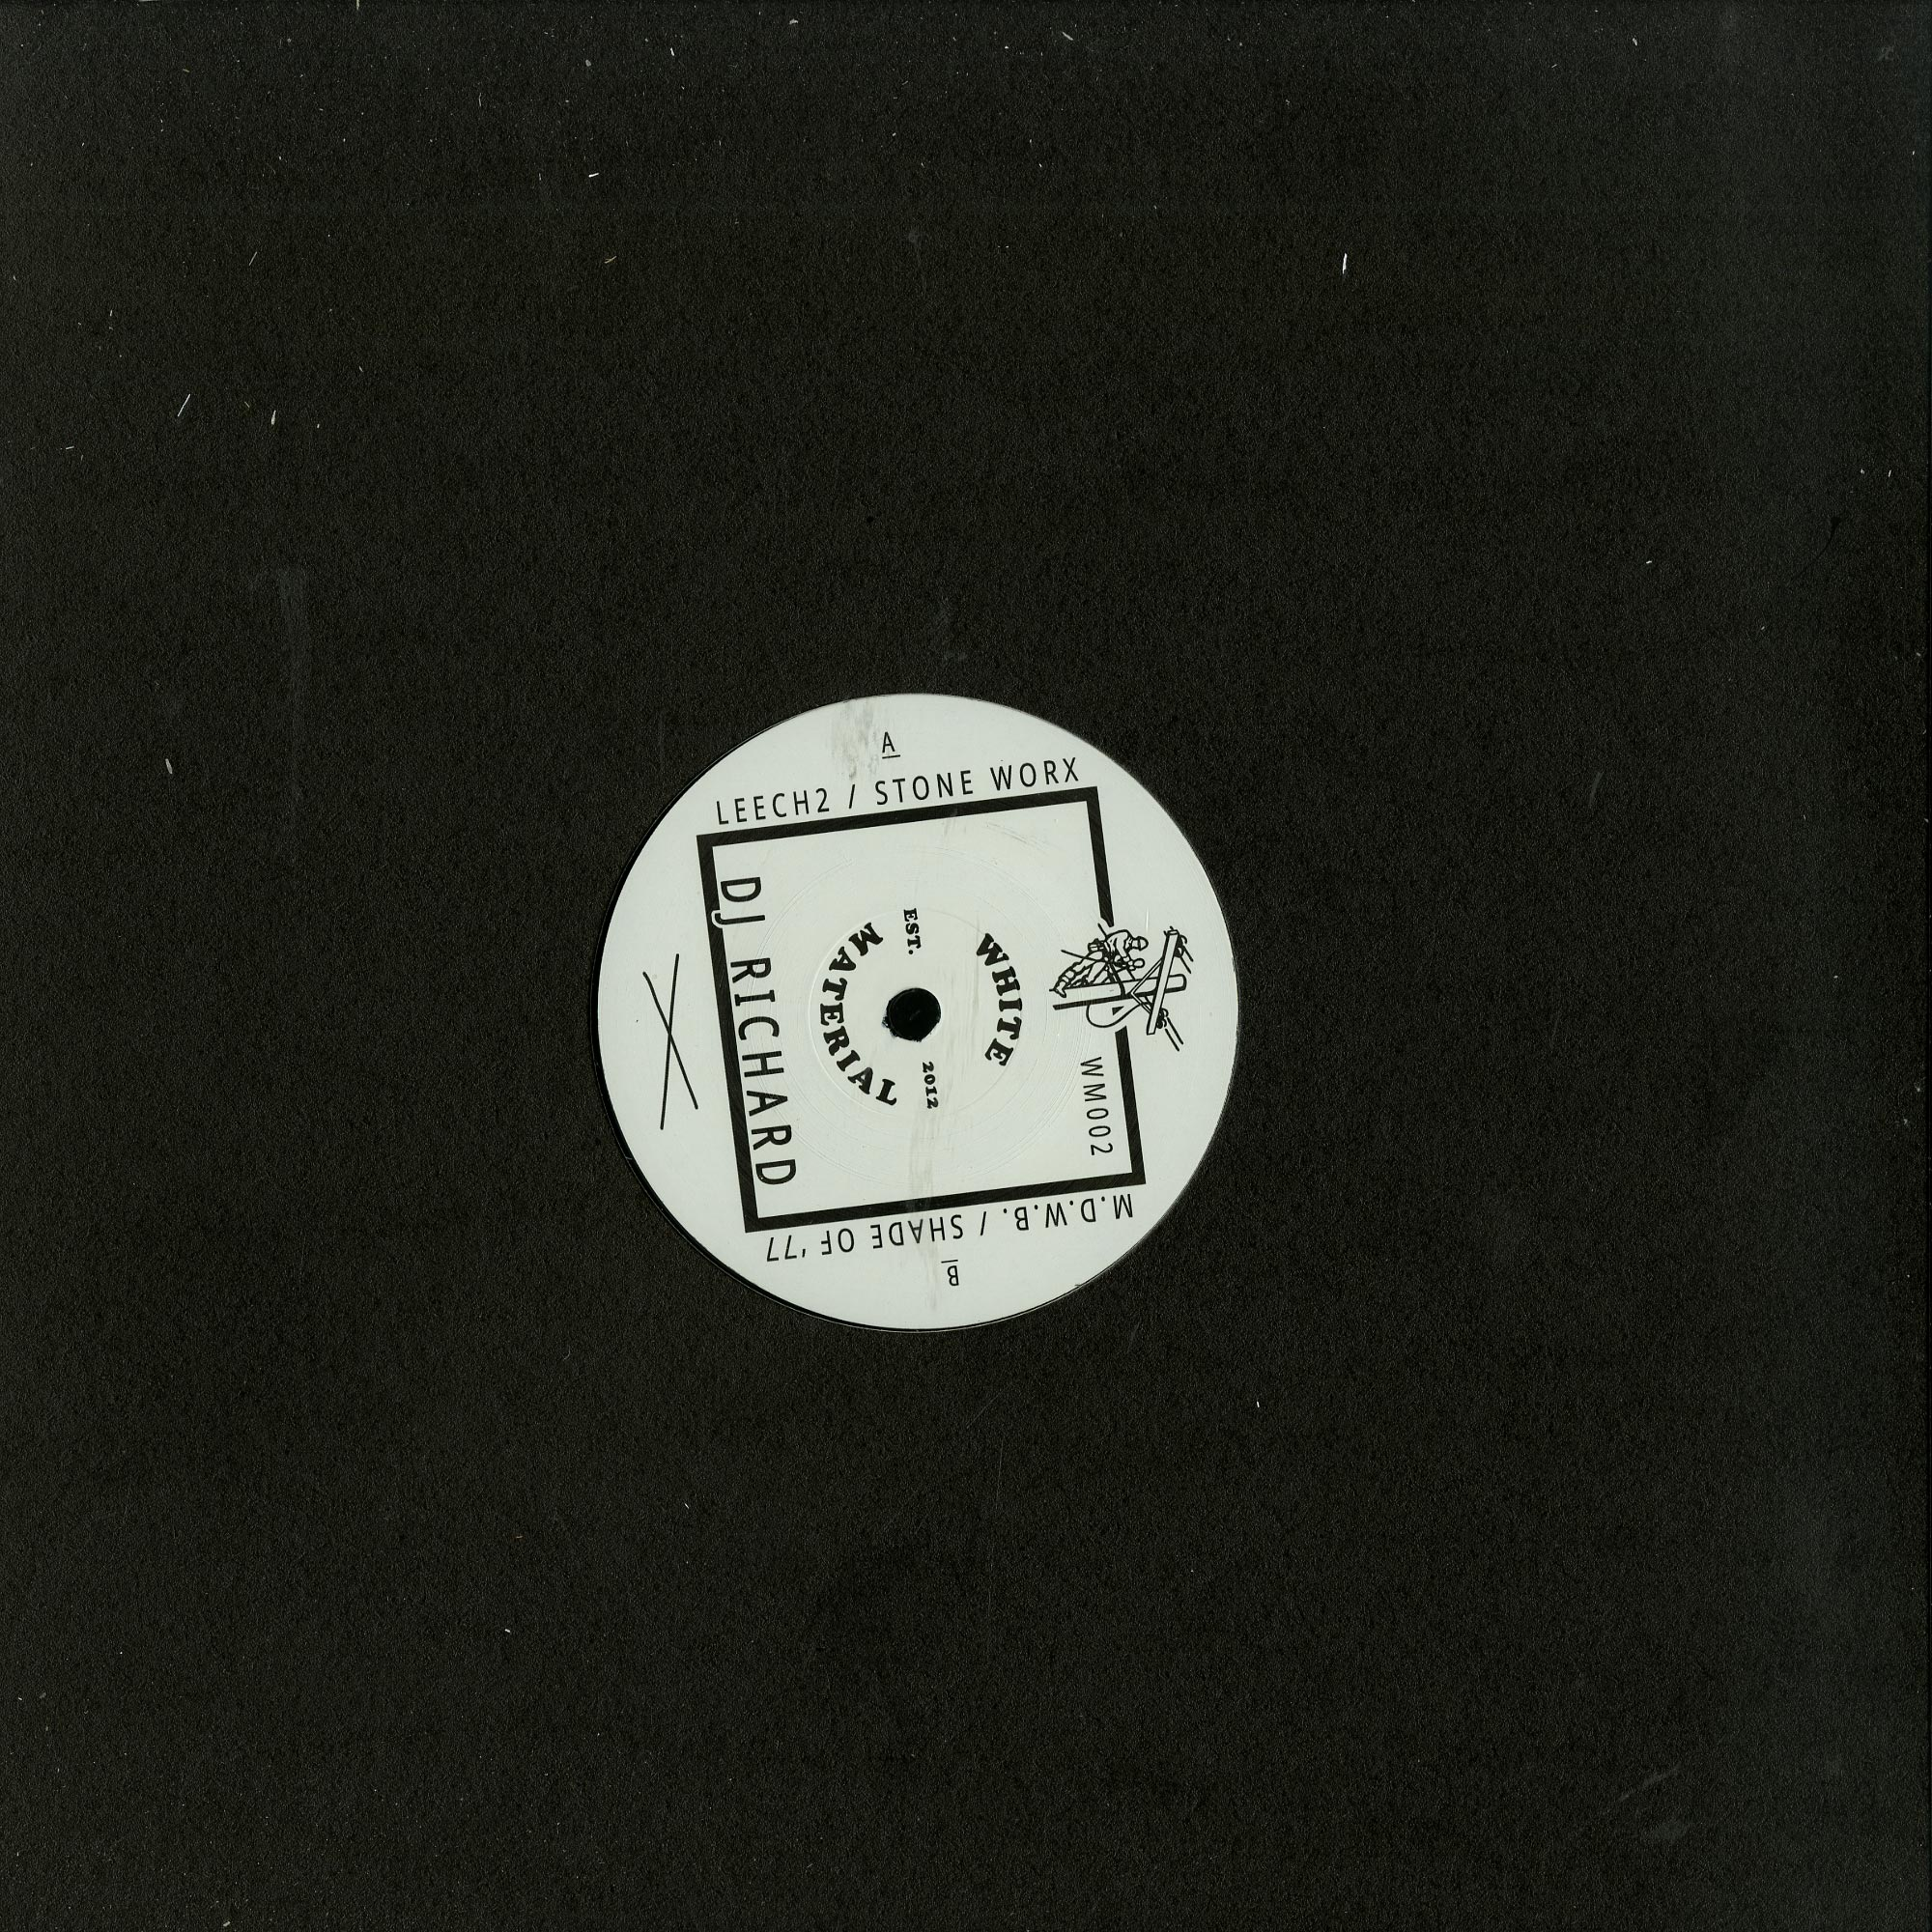 DJ Richard - LEECH2